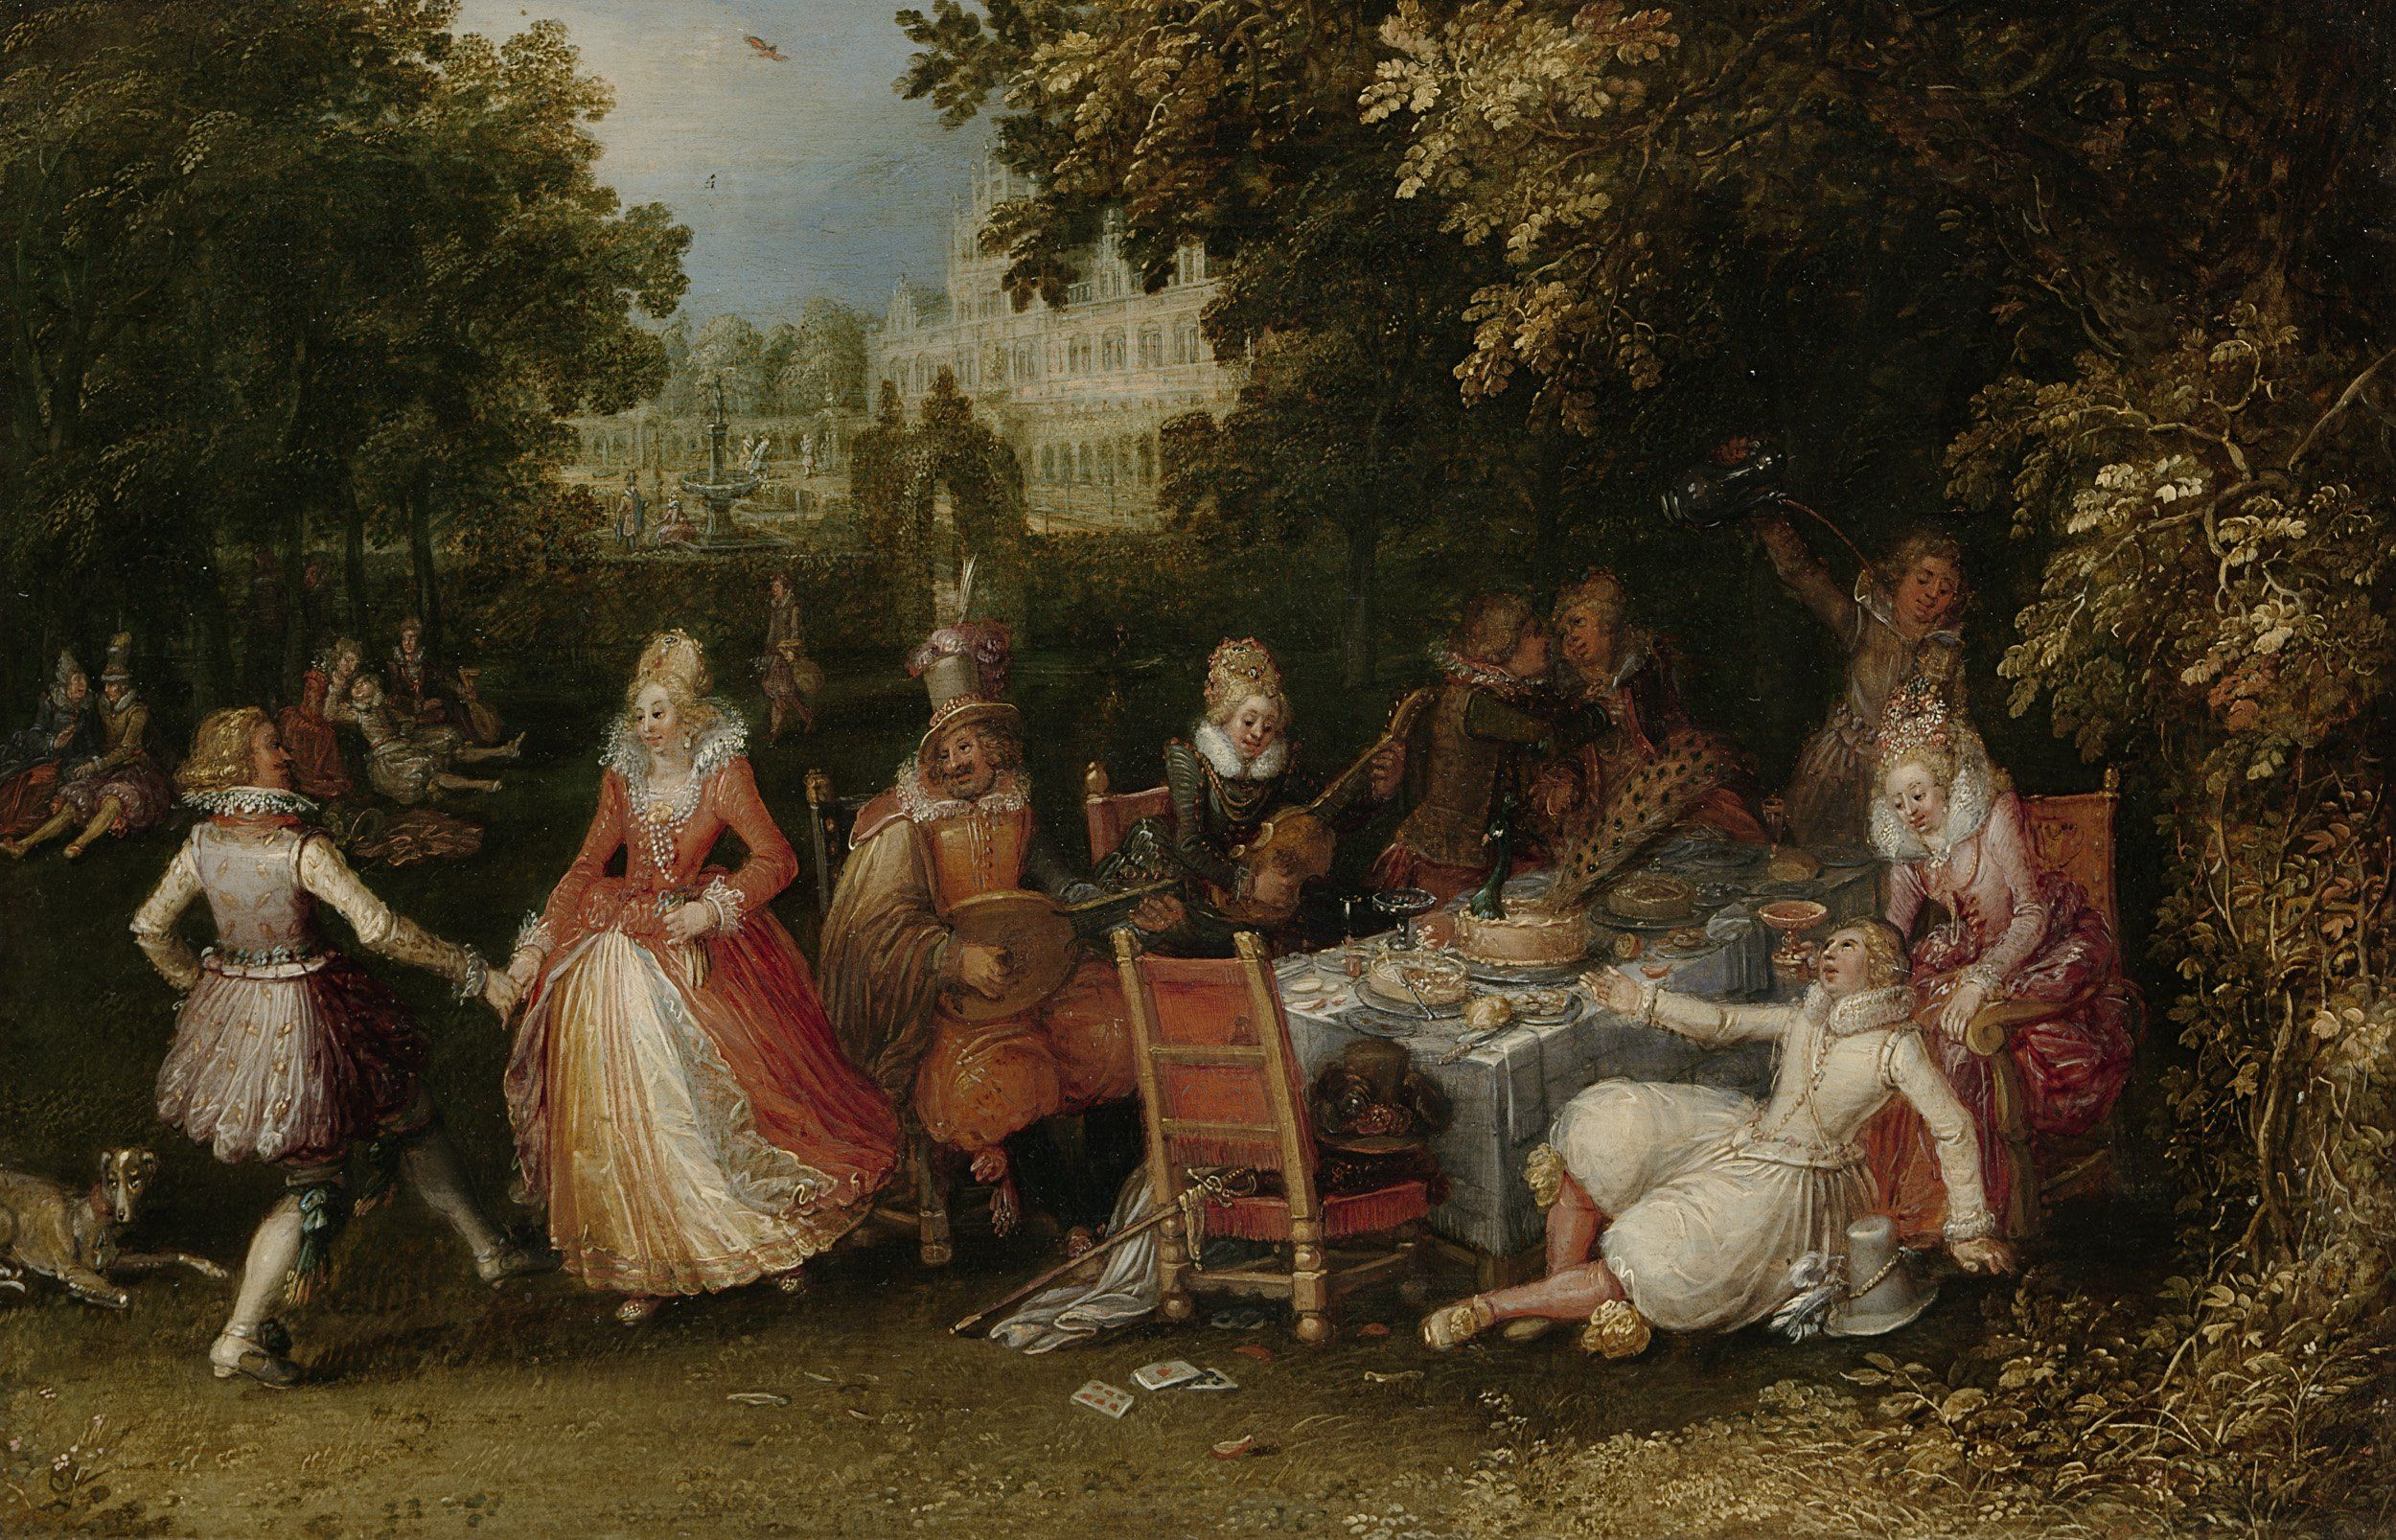 Garden Party (Fête Champêtre) by David Vinckboons, 1610. Rijksmuseum ...